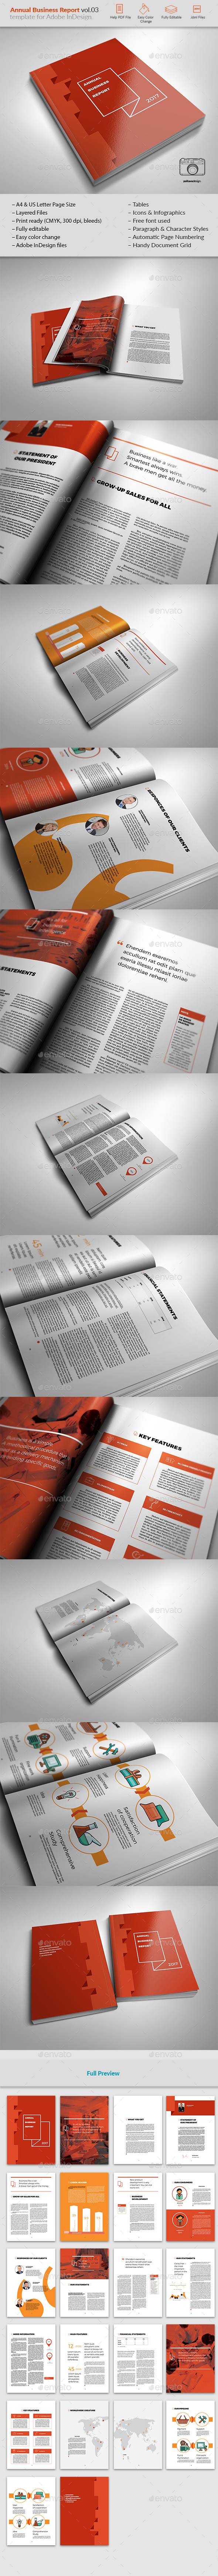 Annual Report Template vol.03 - Brochures Print Templates